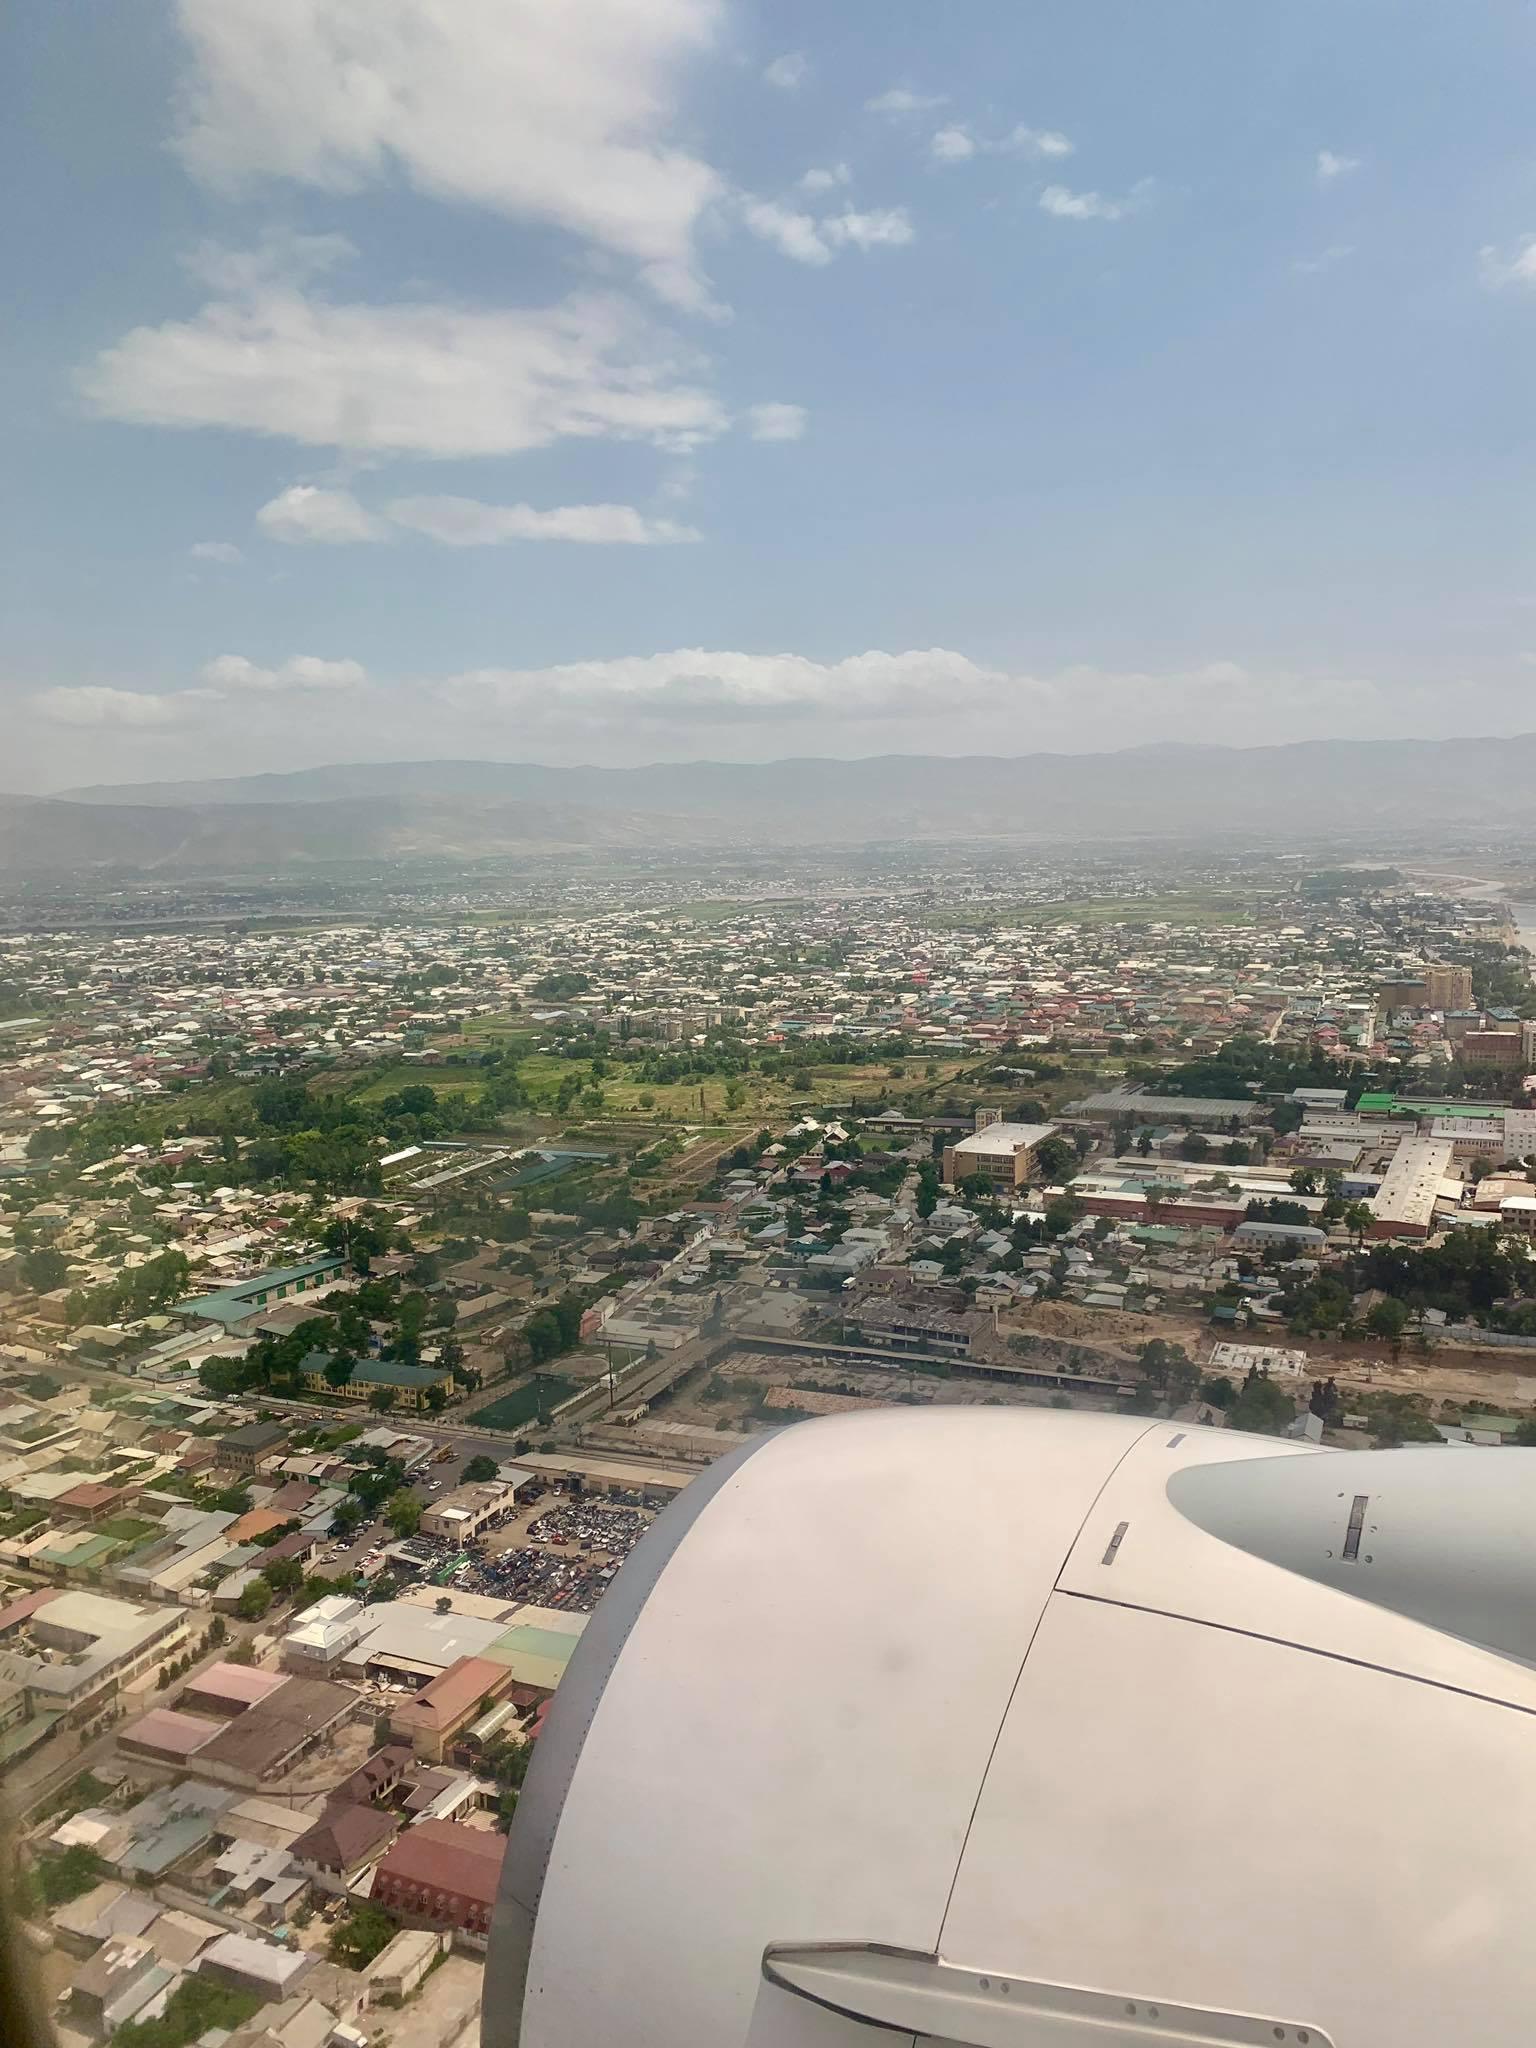 Kach Solo Travels in 2019 I just arrived in Dushanbe, Tajikistan3.jpg